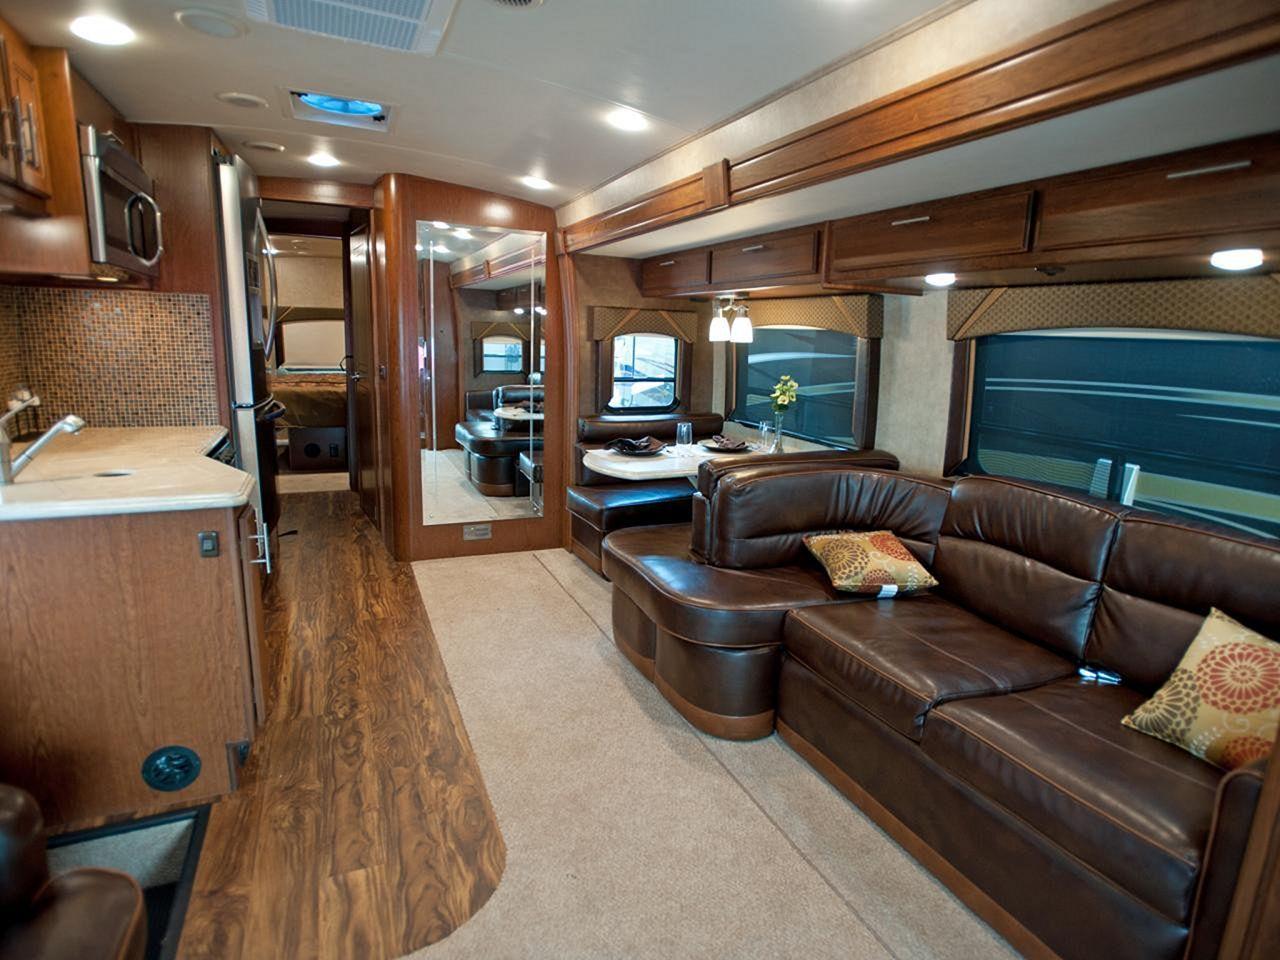 40 Incredible RV Interior Design Ideas For You Modern Freshoom